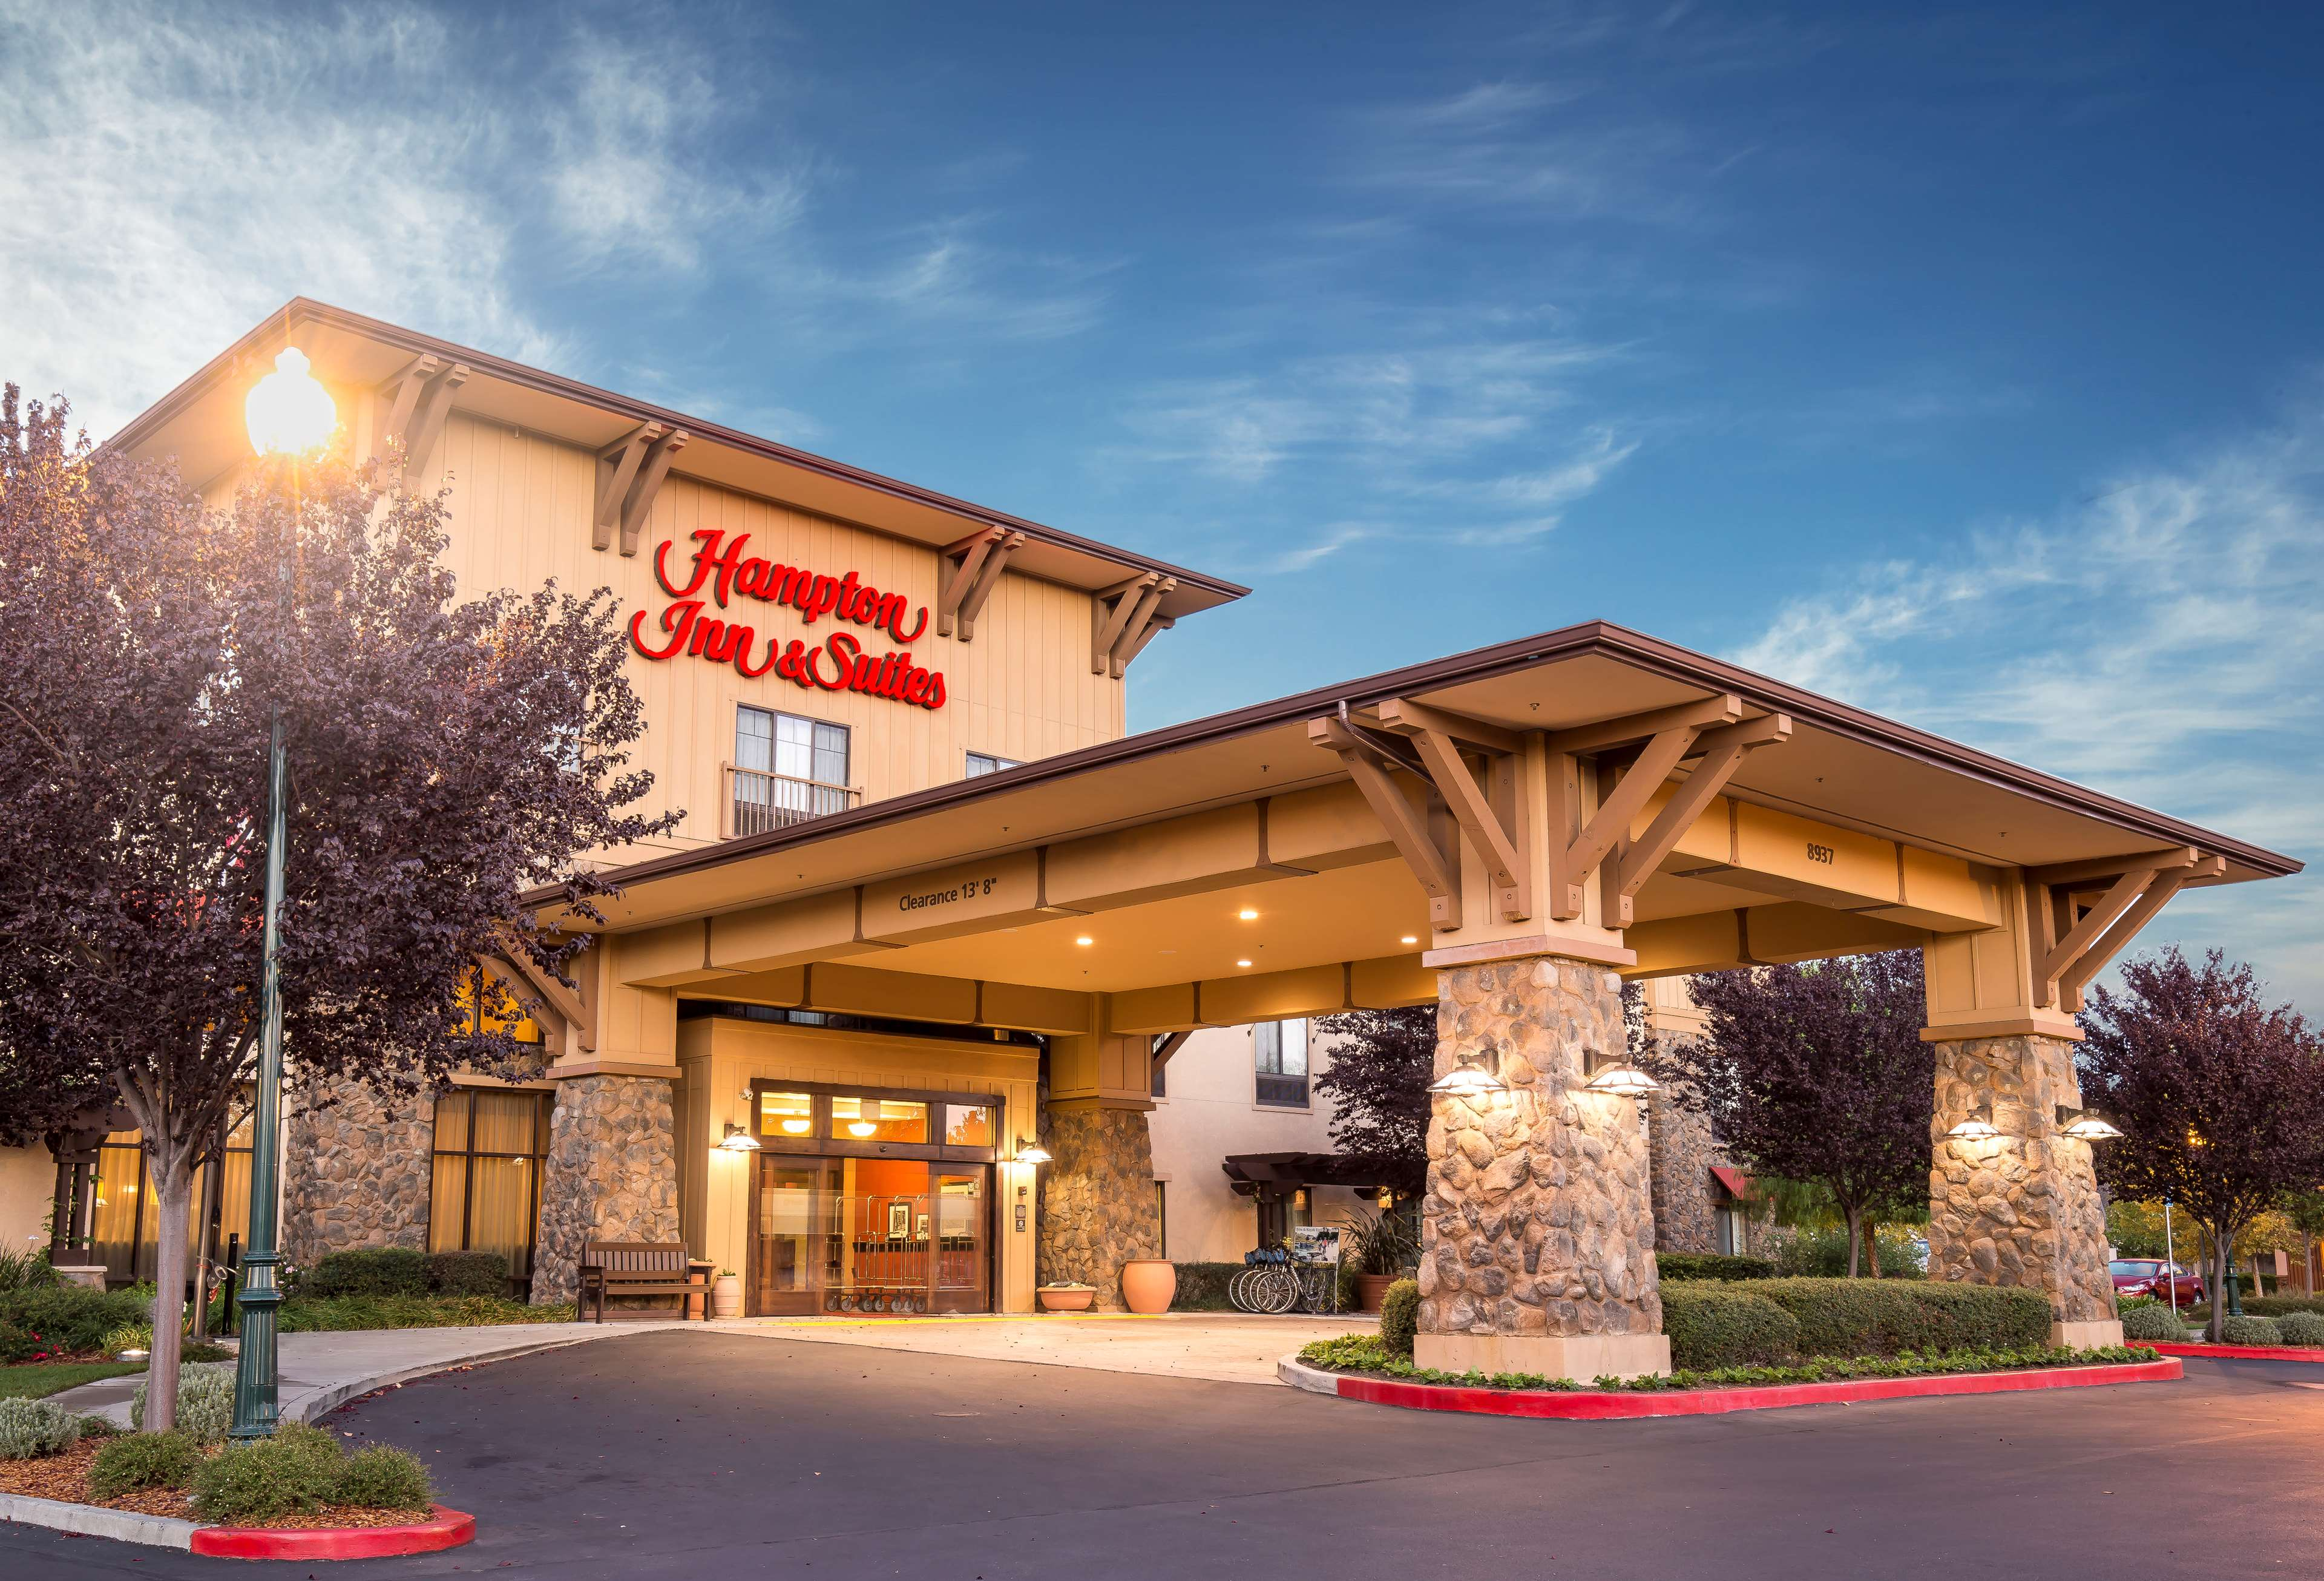 Hampton Inn & Suites Windsor - Sonoma Wine Country image 0